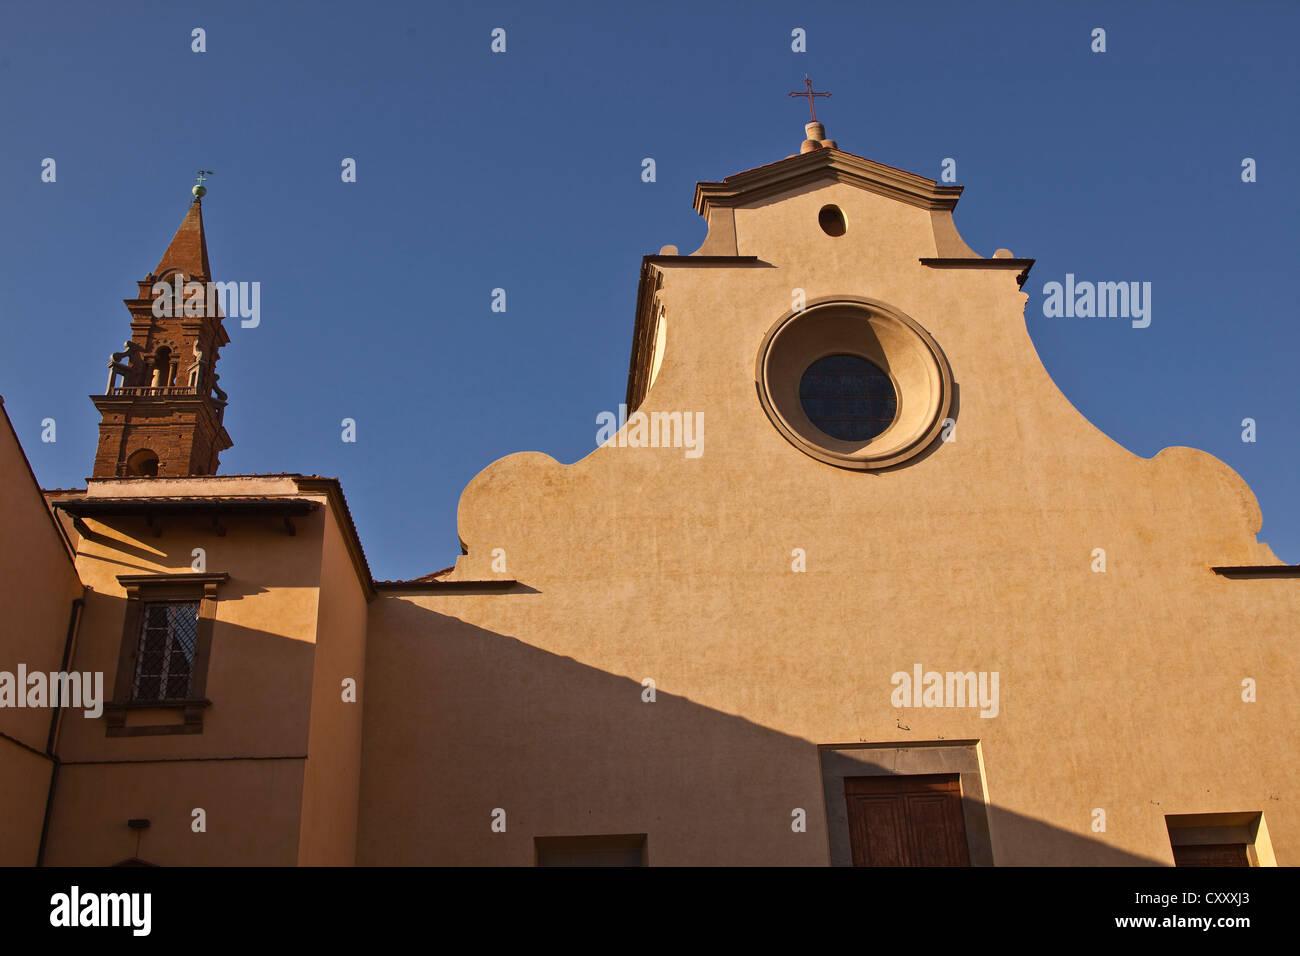 The basilica di santo spirito in Florence, Italy. Stock Photo